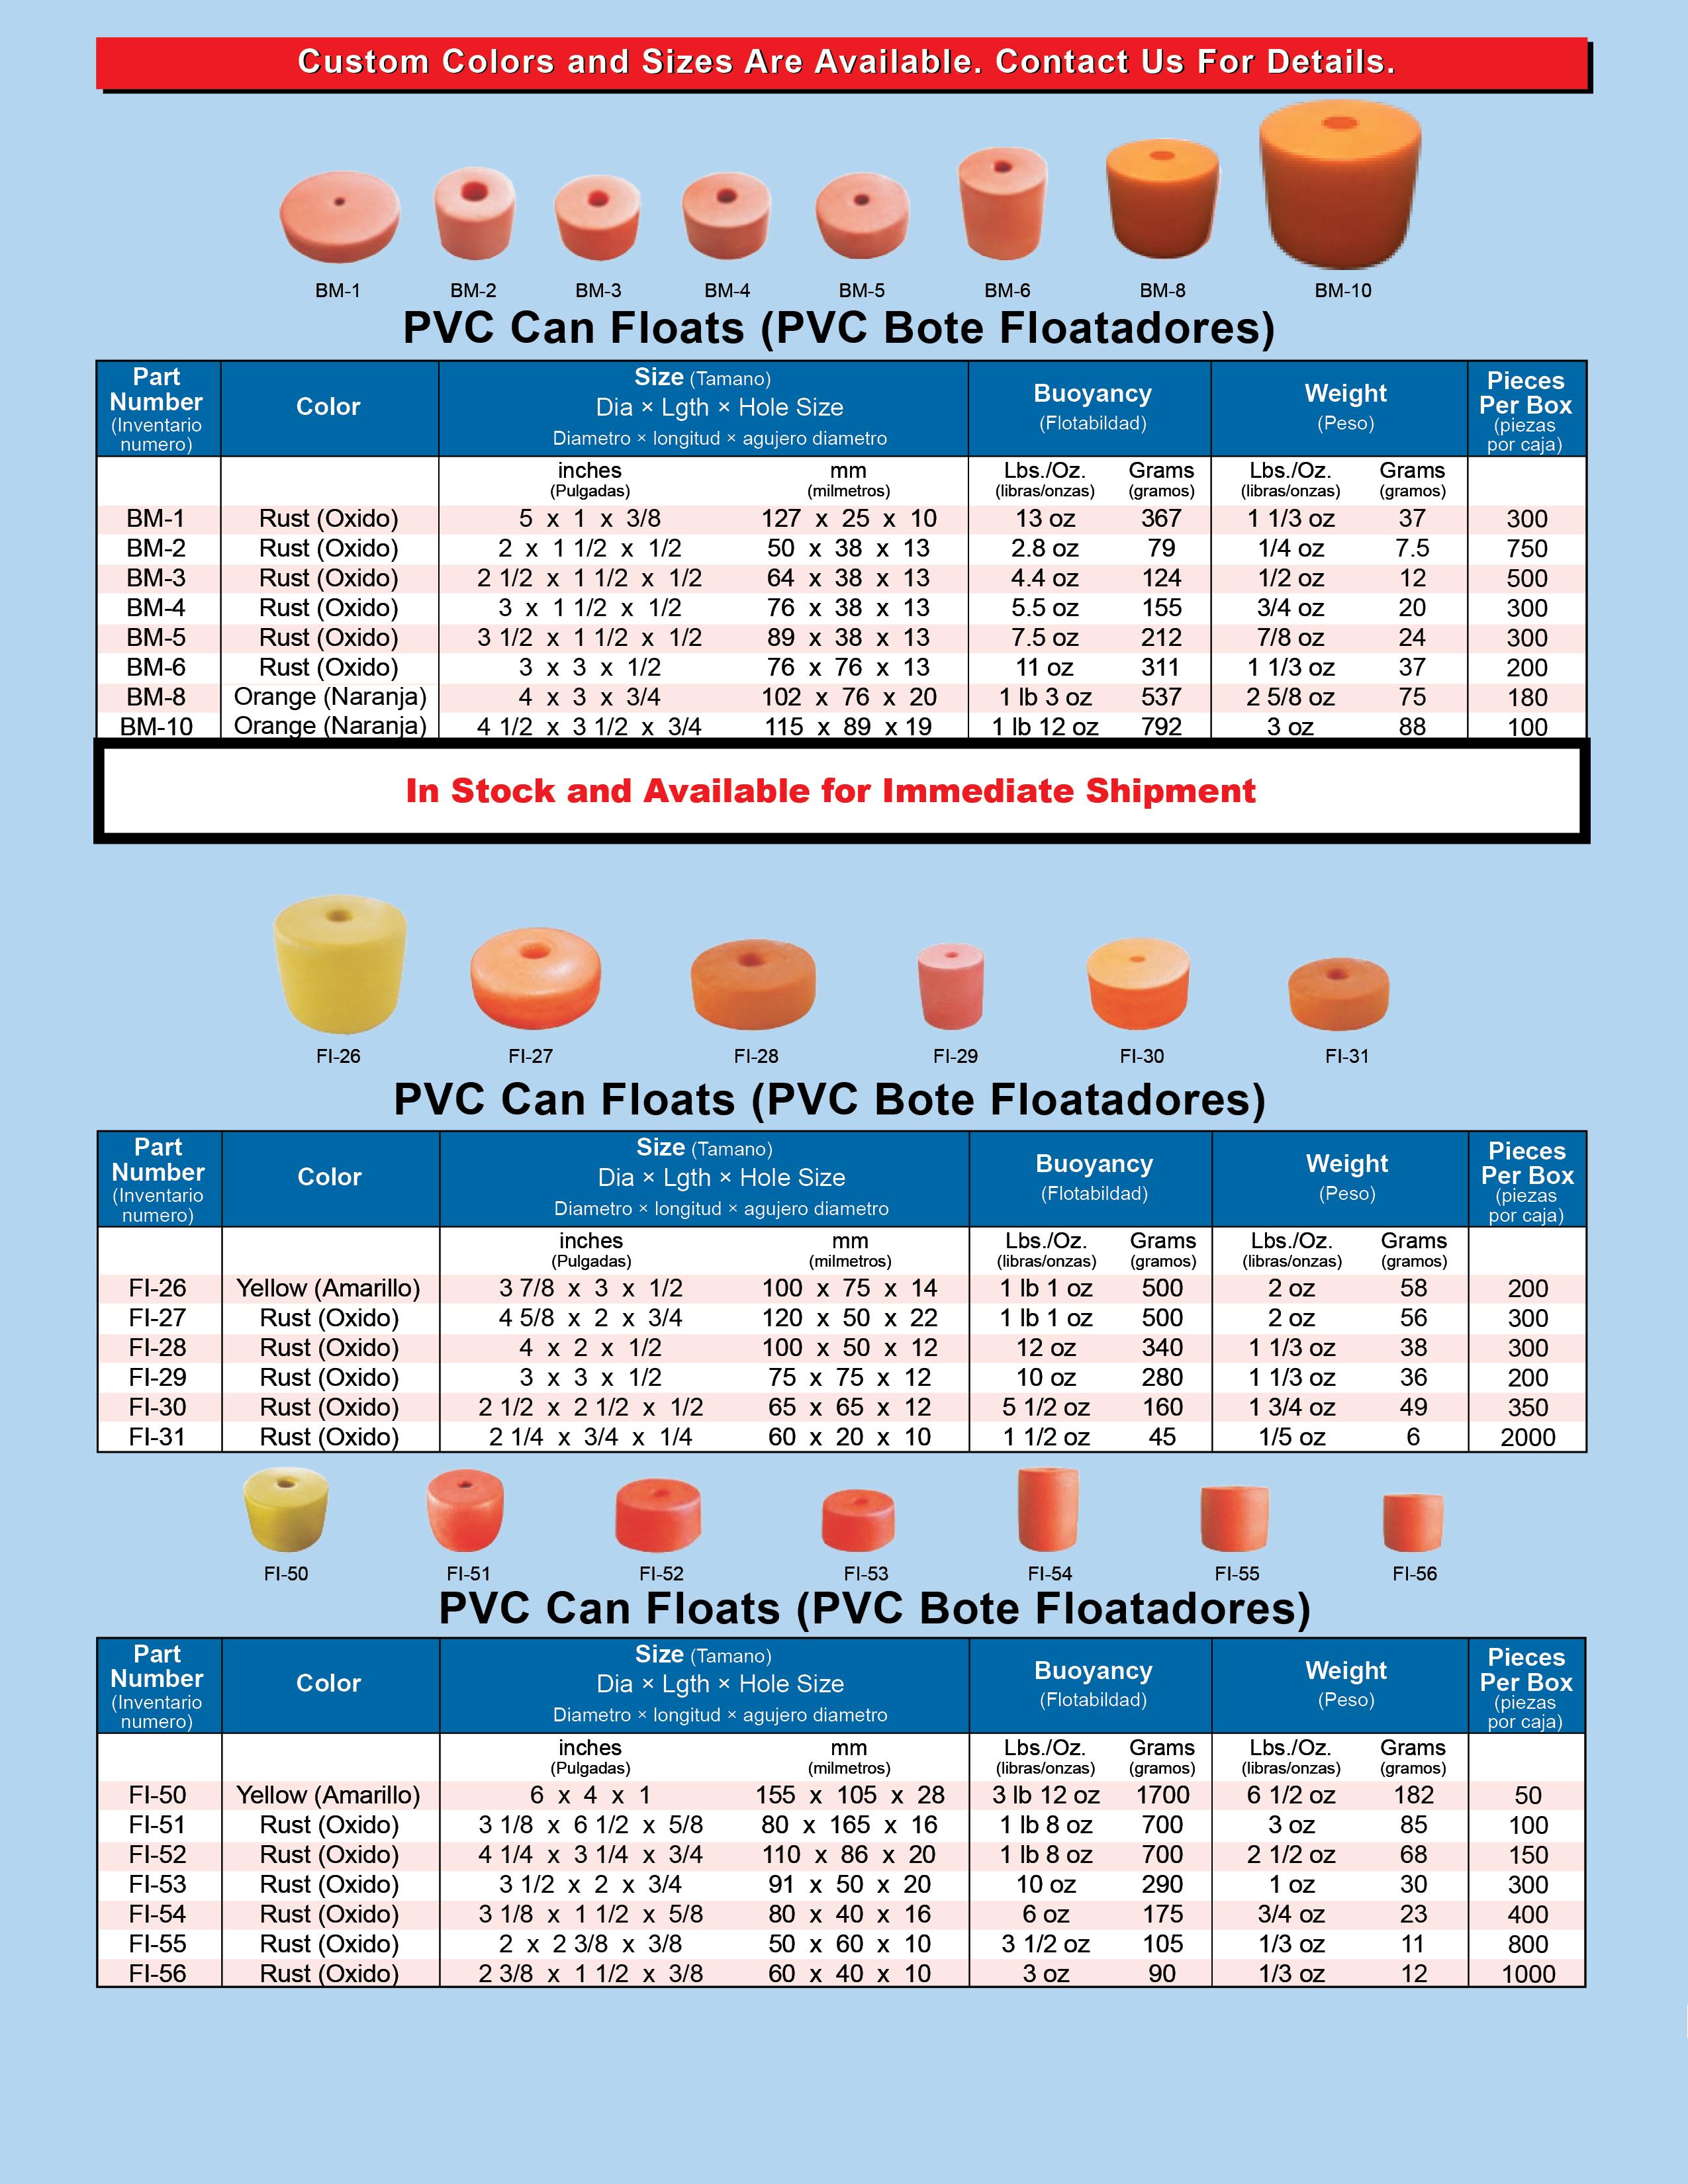 PVC Can Floats